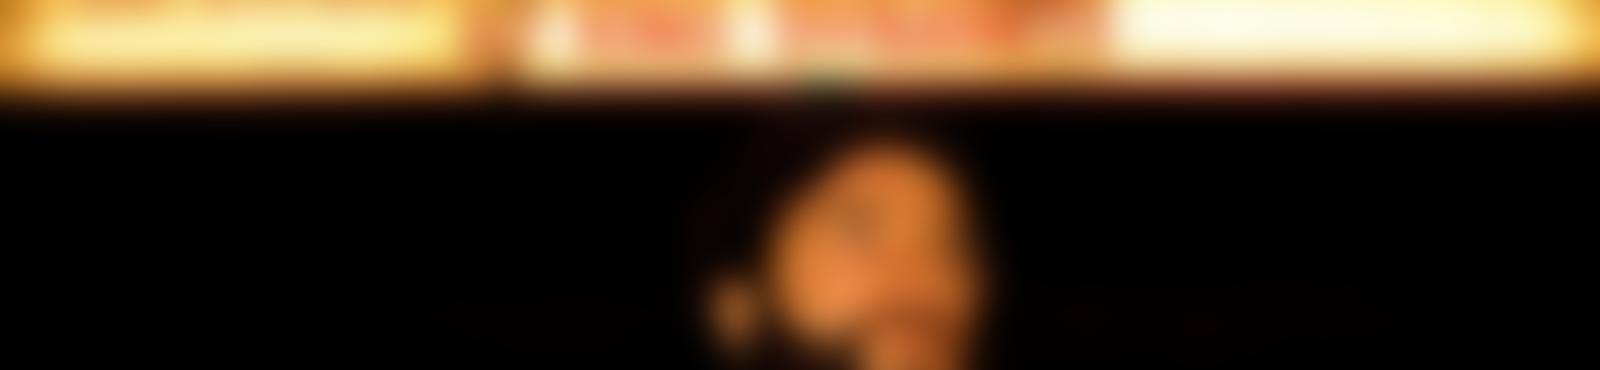 Blurred 2ba30ee5 6b7e 4184 b1c6 d480c0bd5412